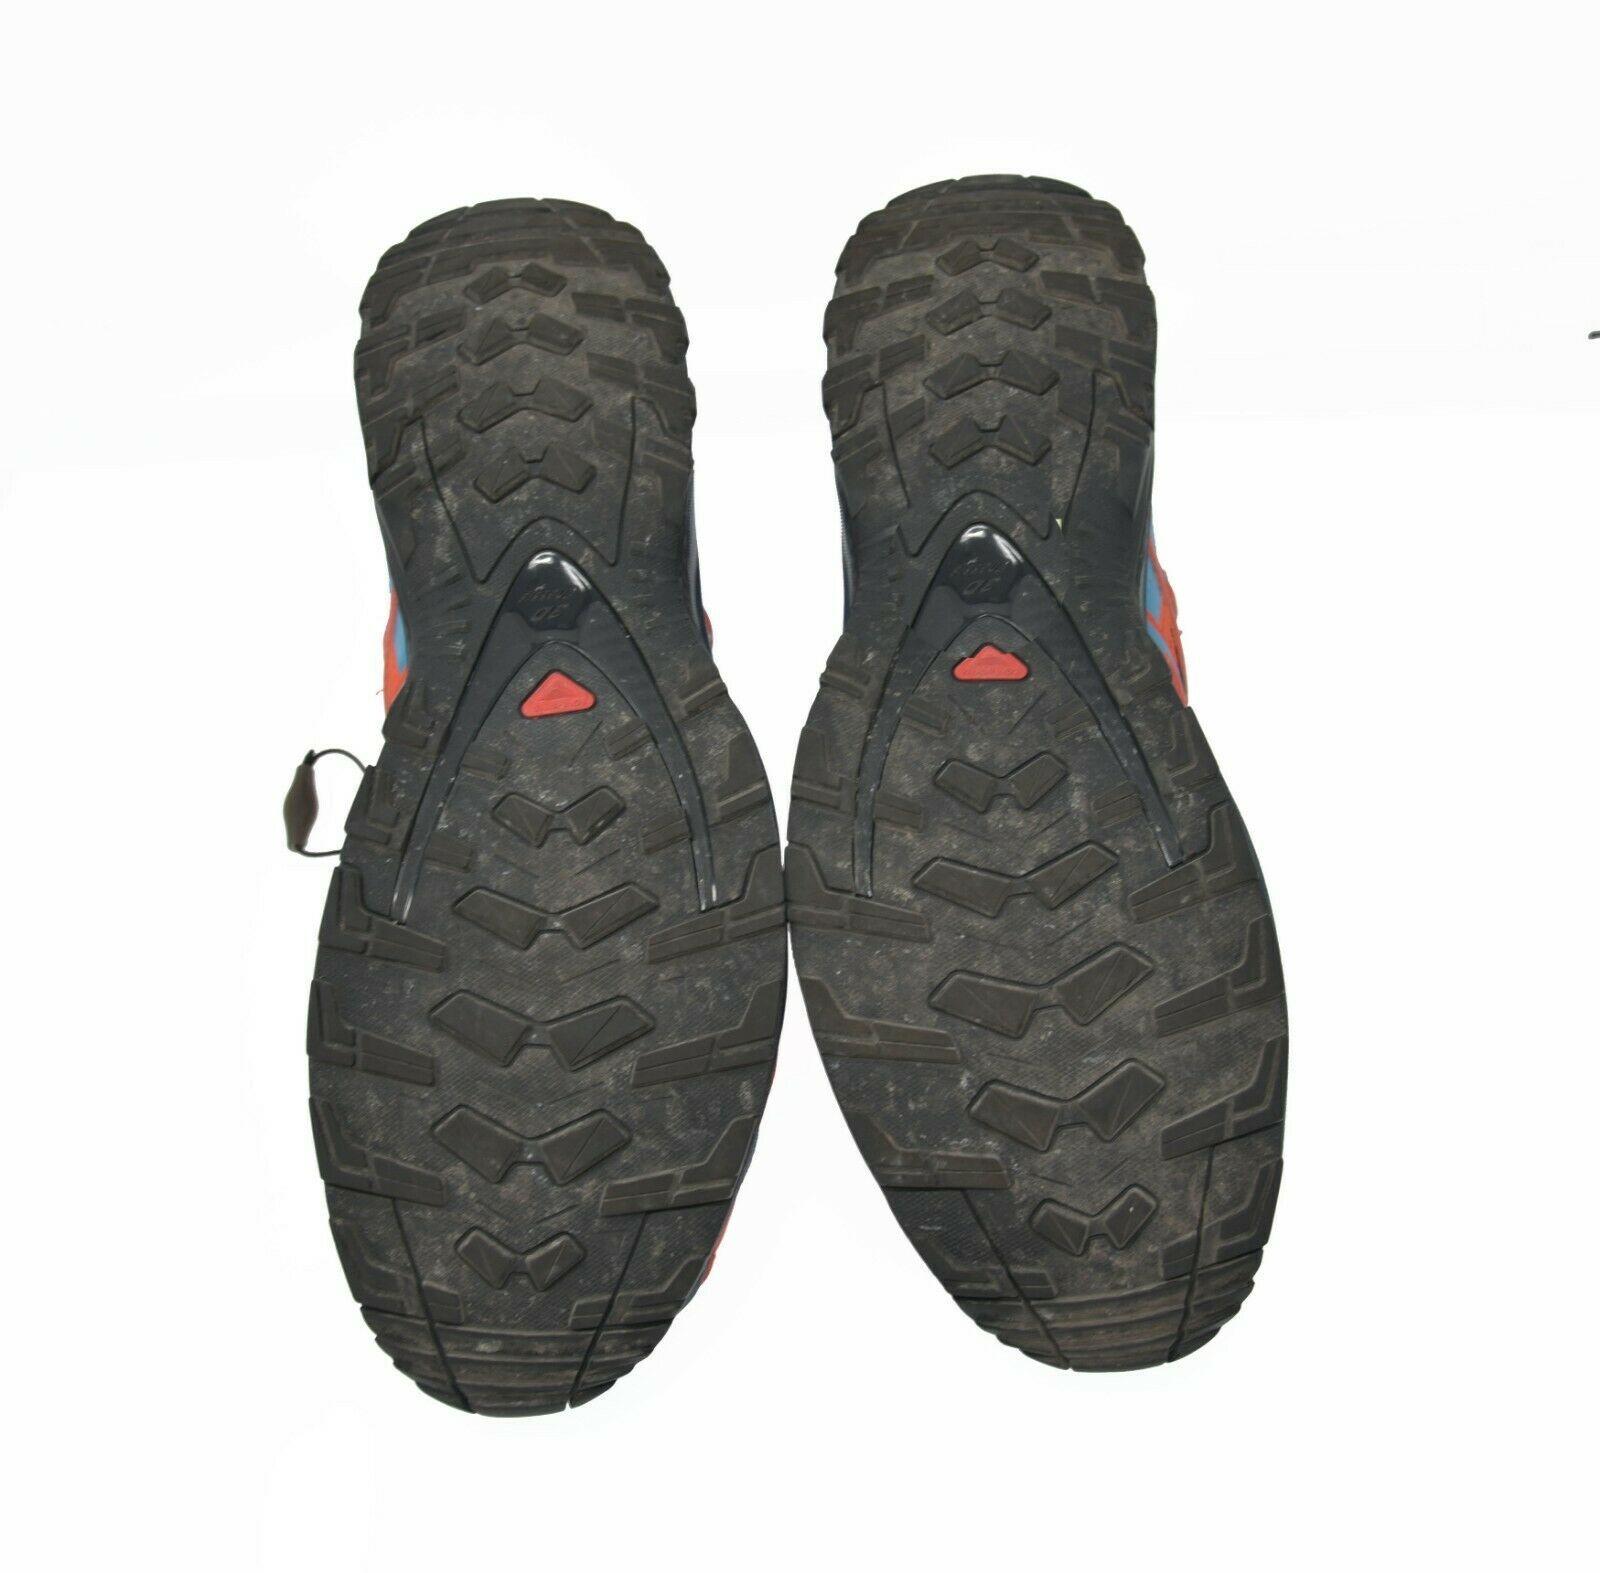 Solomon XA PRO 3D Trail Running Men's Sz 12.5 EU 47.5 Hiking Trail Sports Shoes image 5